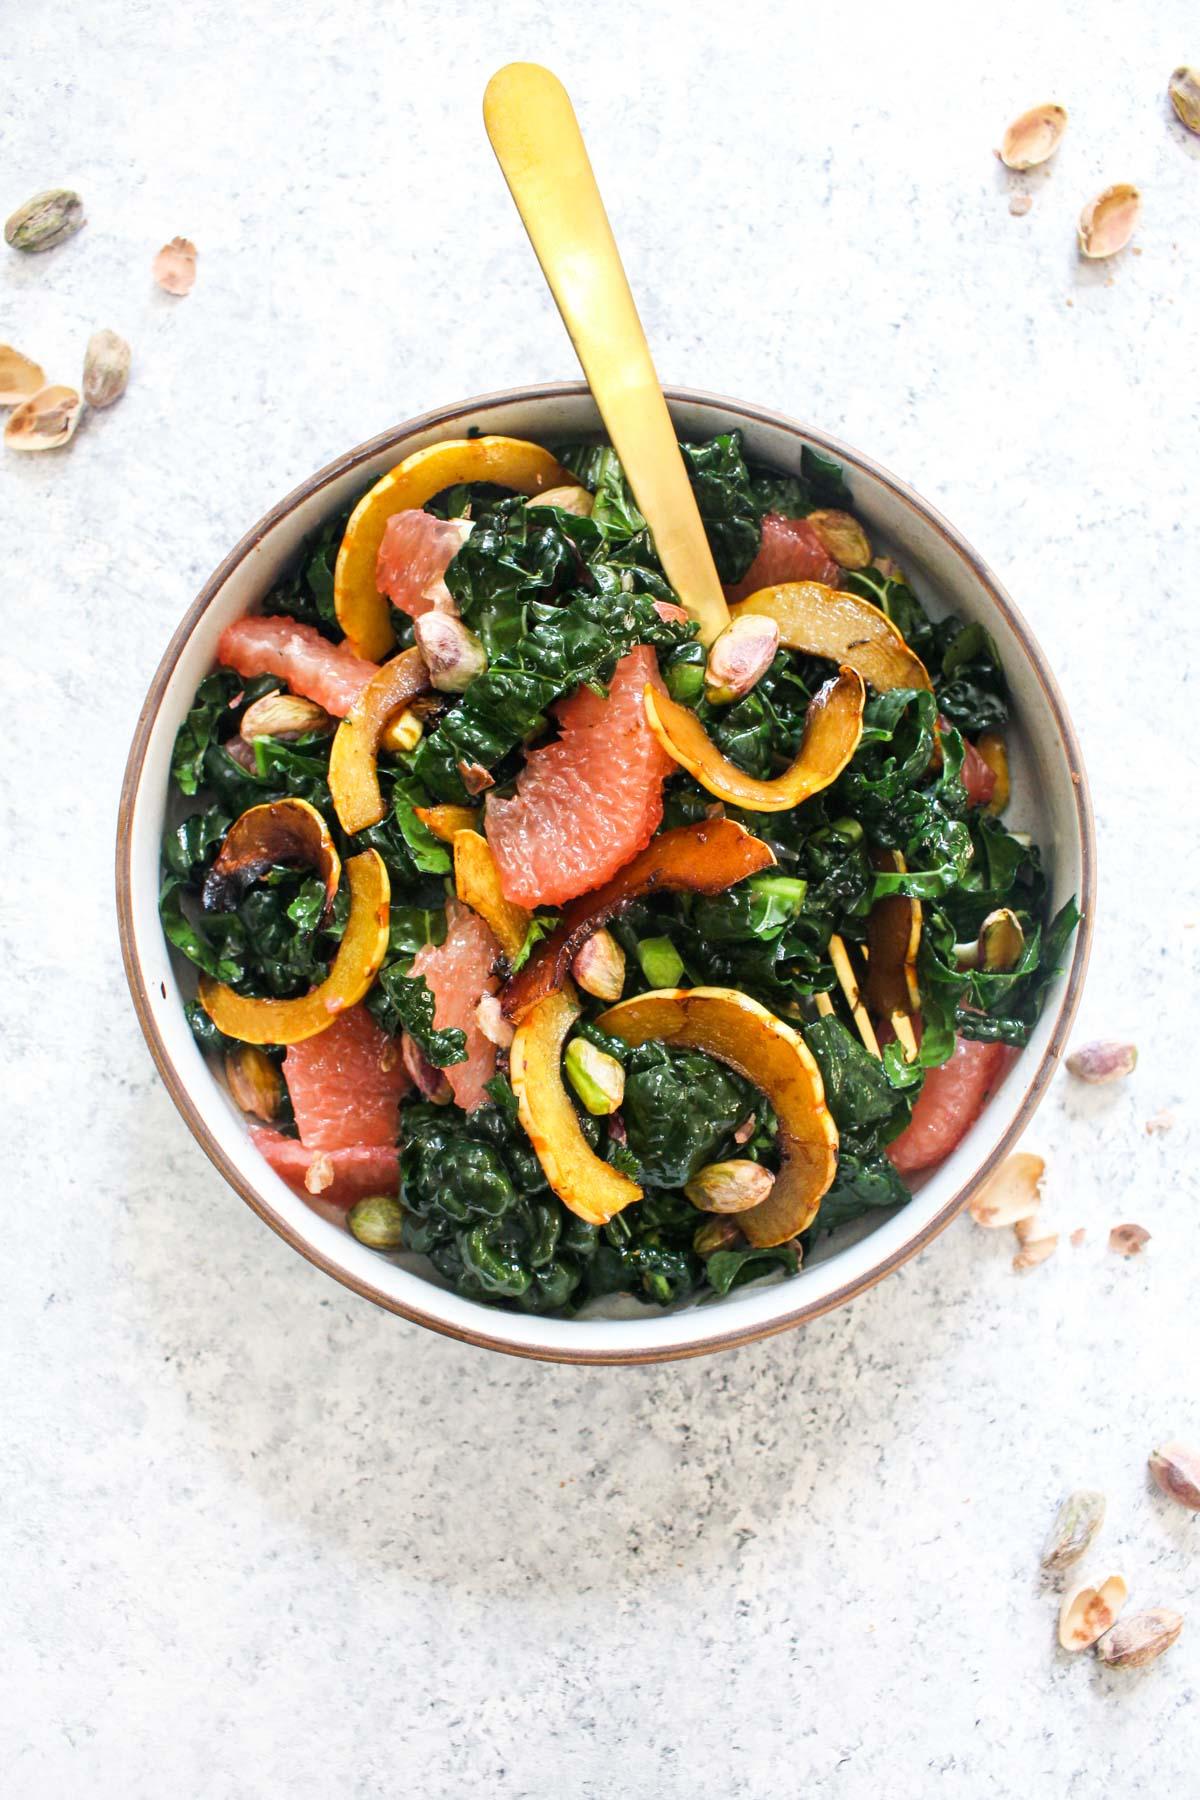 Winter Kale Salad Recipe With Grapefruit Balsamic Delicata Squash